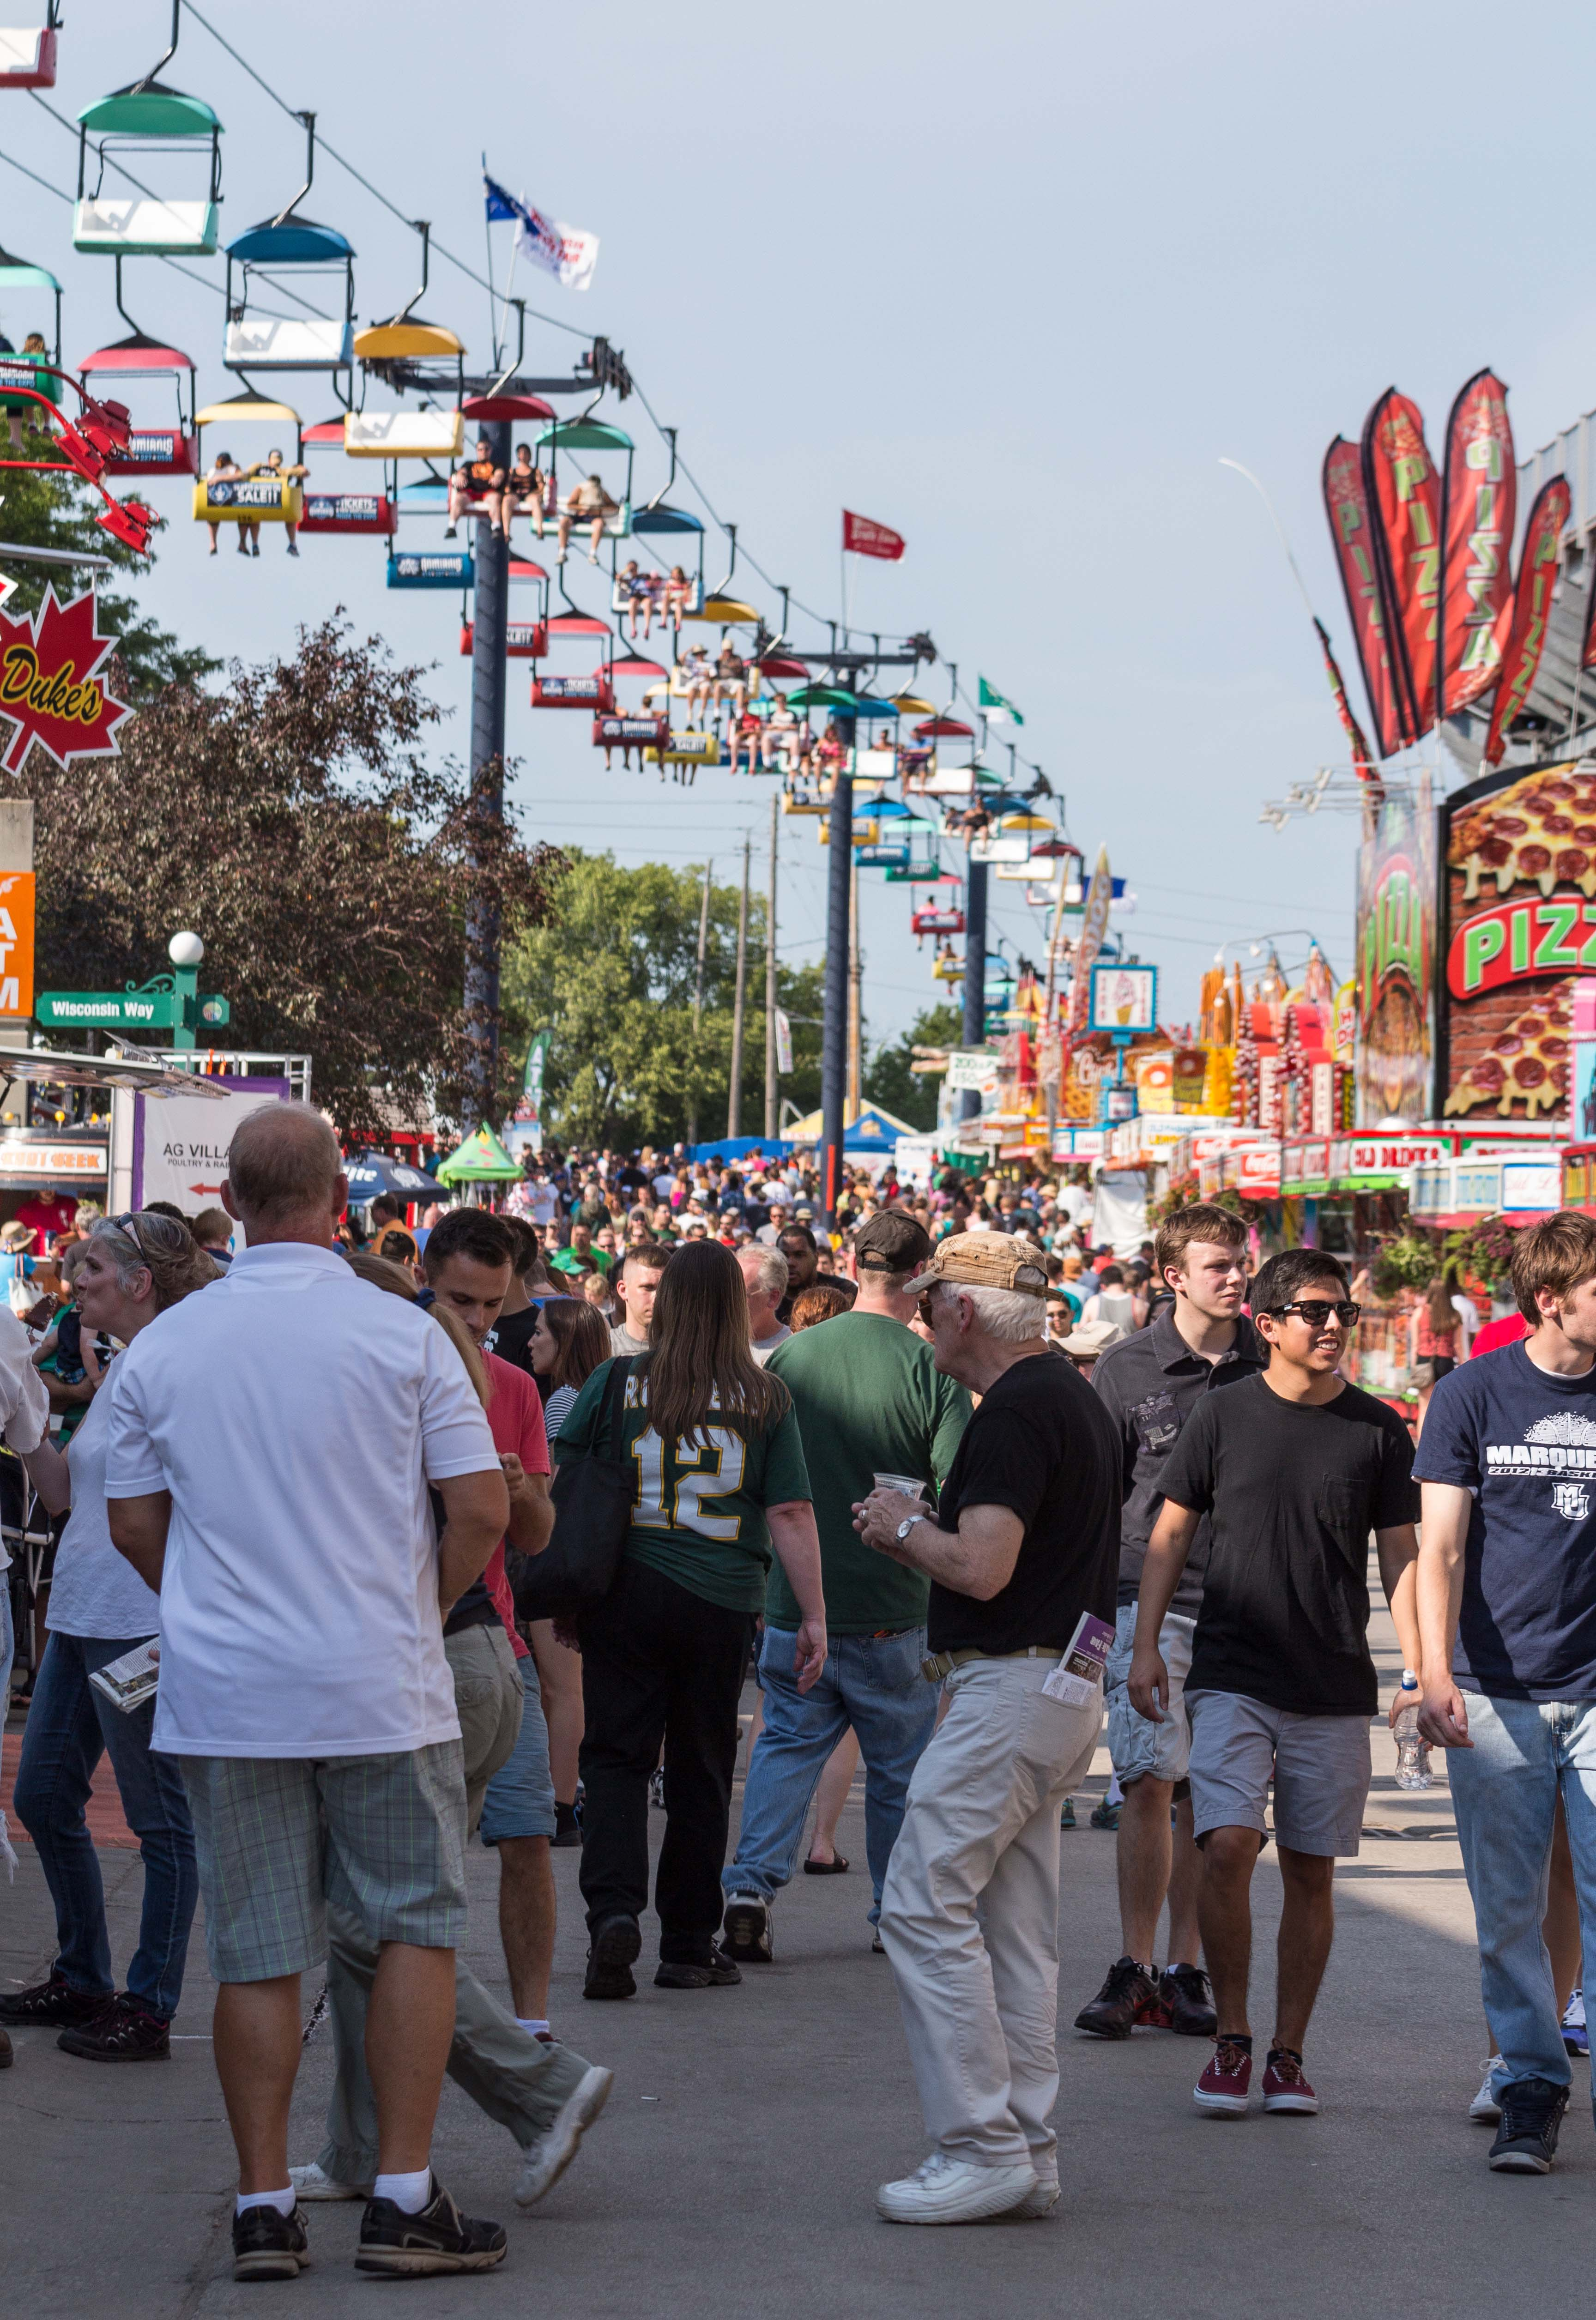 Wisconsin State Fair 2015 #Wisconsin #WisconsinStateFair #statefair | https://www.roseclearfield.com